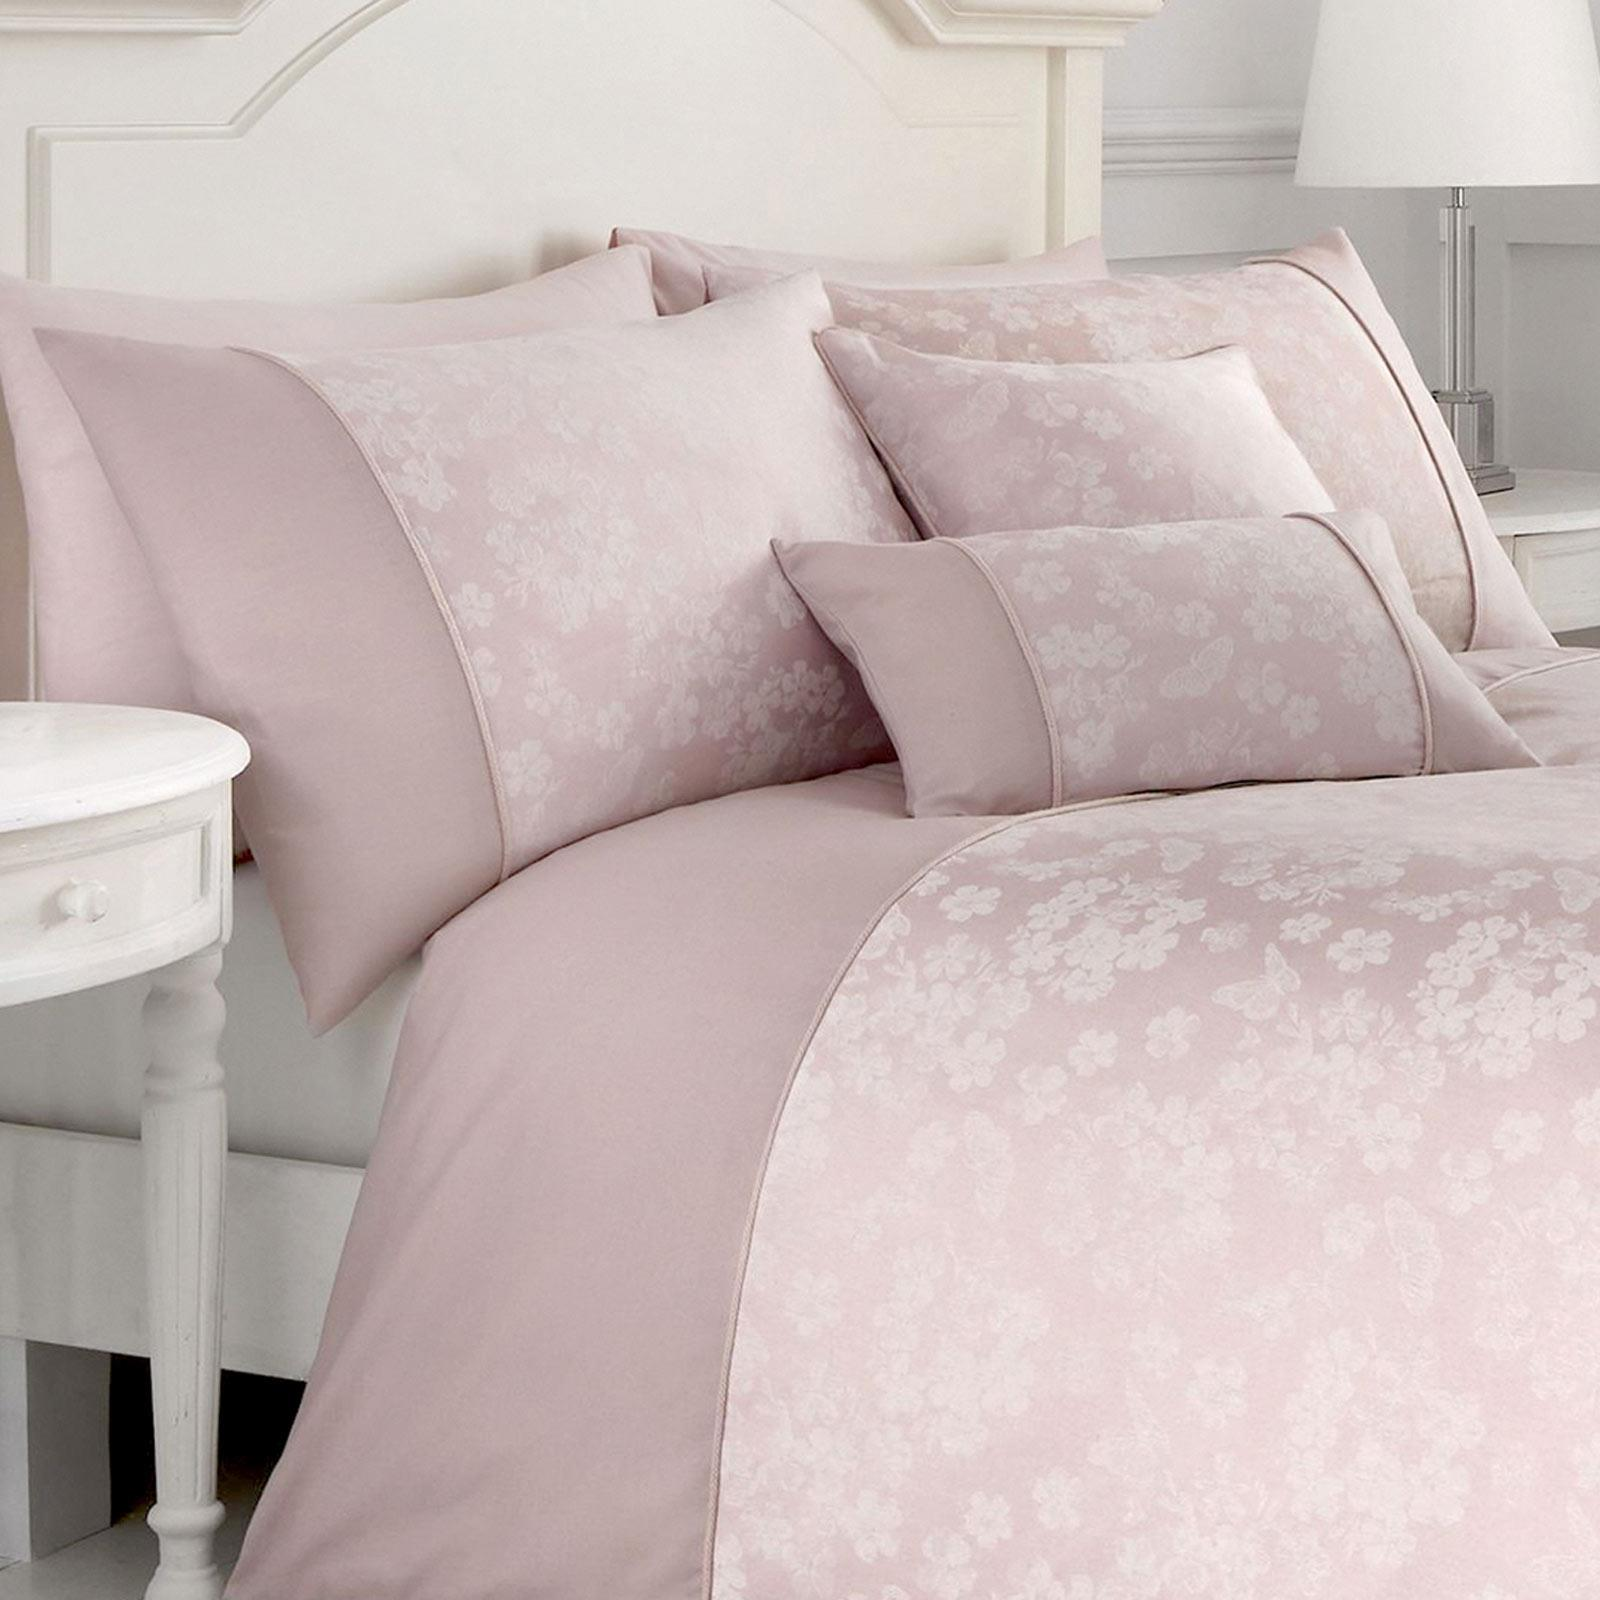 Fundas-de-Edredon-Rosa-Blush-Jacquard-Floral-Cubierta-Del-Edredon-Conjuntos-de-Ropa-de-cama-de-lujo miniatura 14